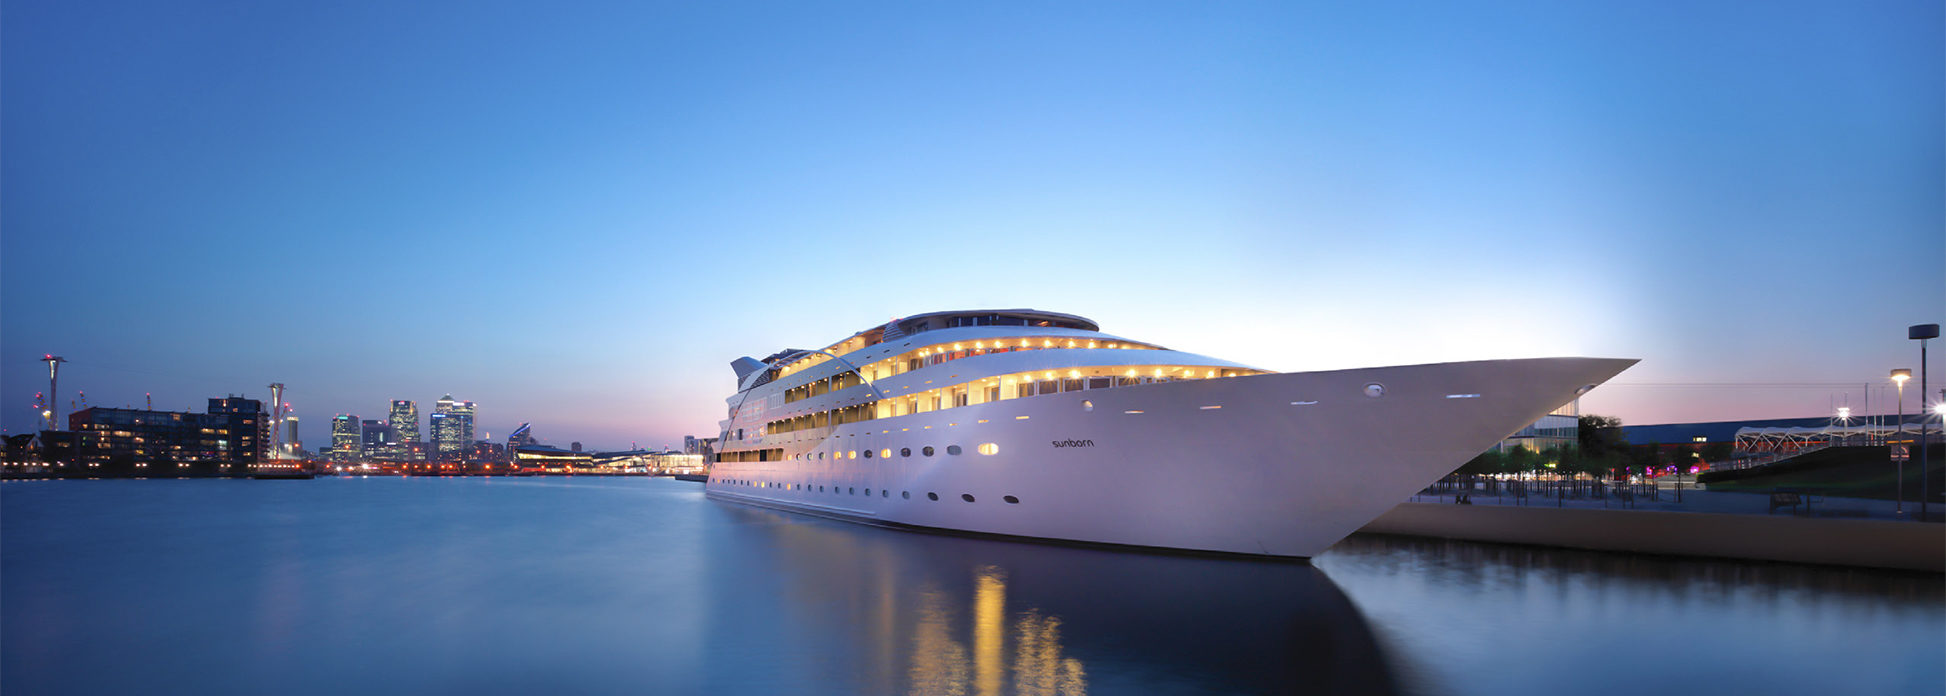 Sunborn, floatel yacht